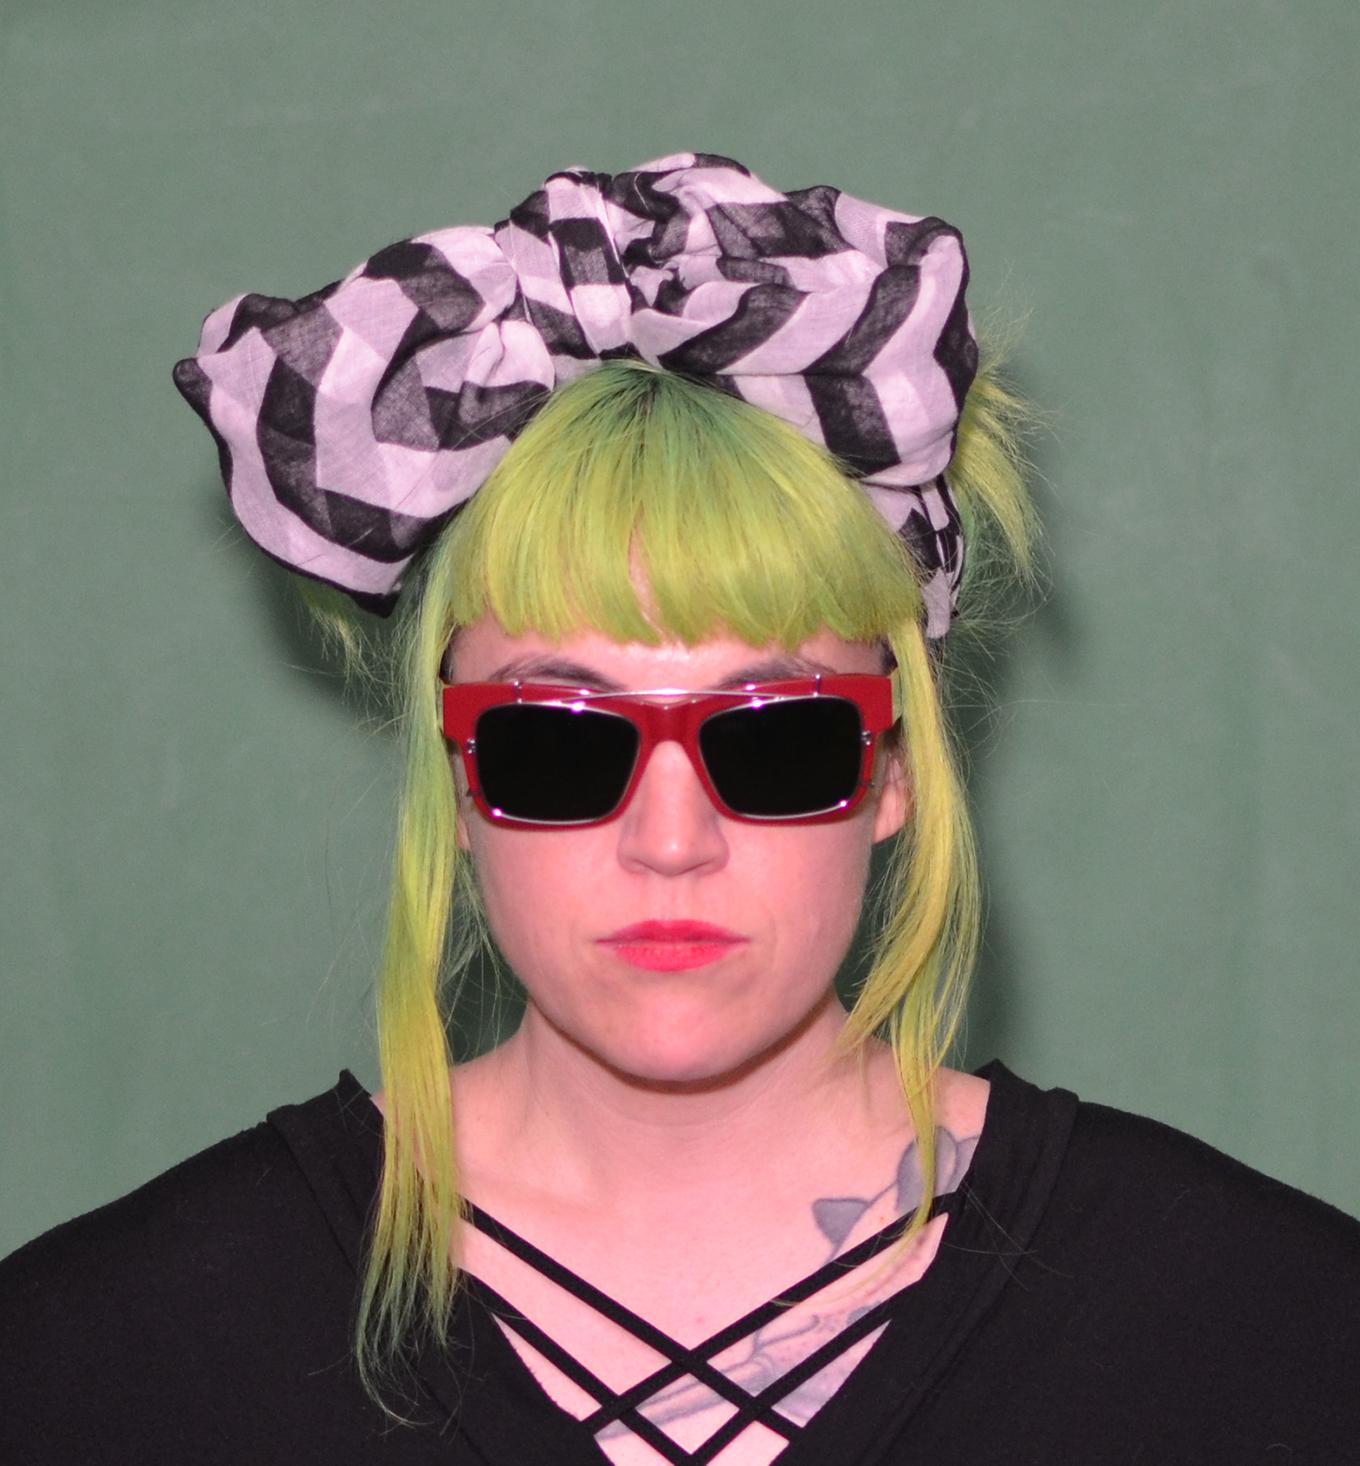 m-reflectacles-ghost-irpair-phantom-facial-recognition-eyewear-sunglasses.jpg